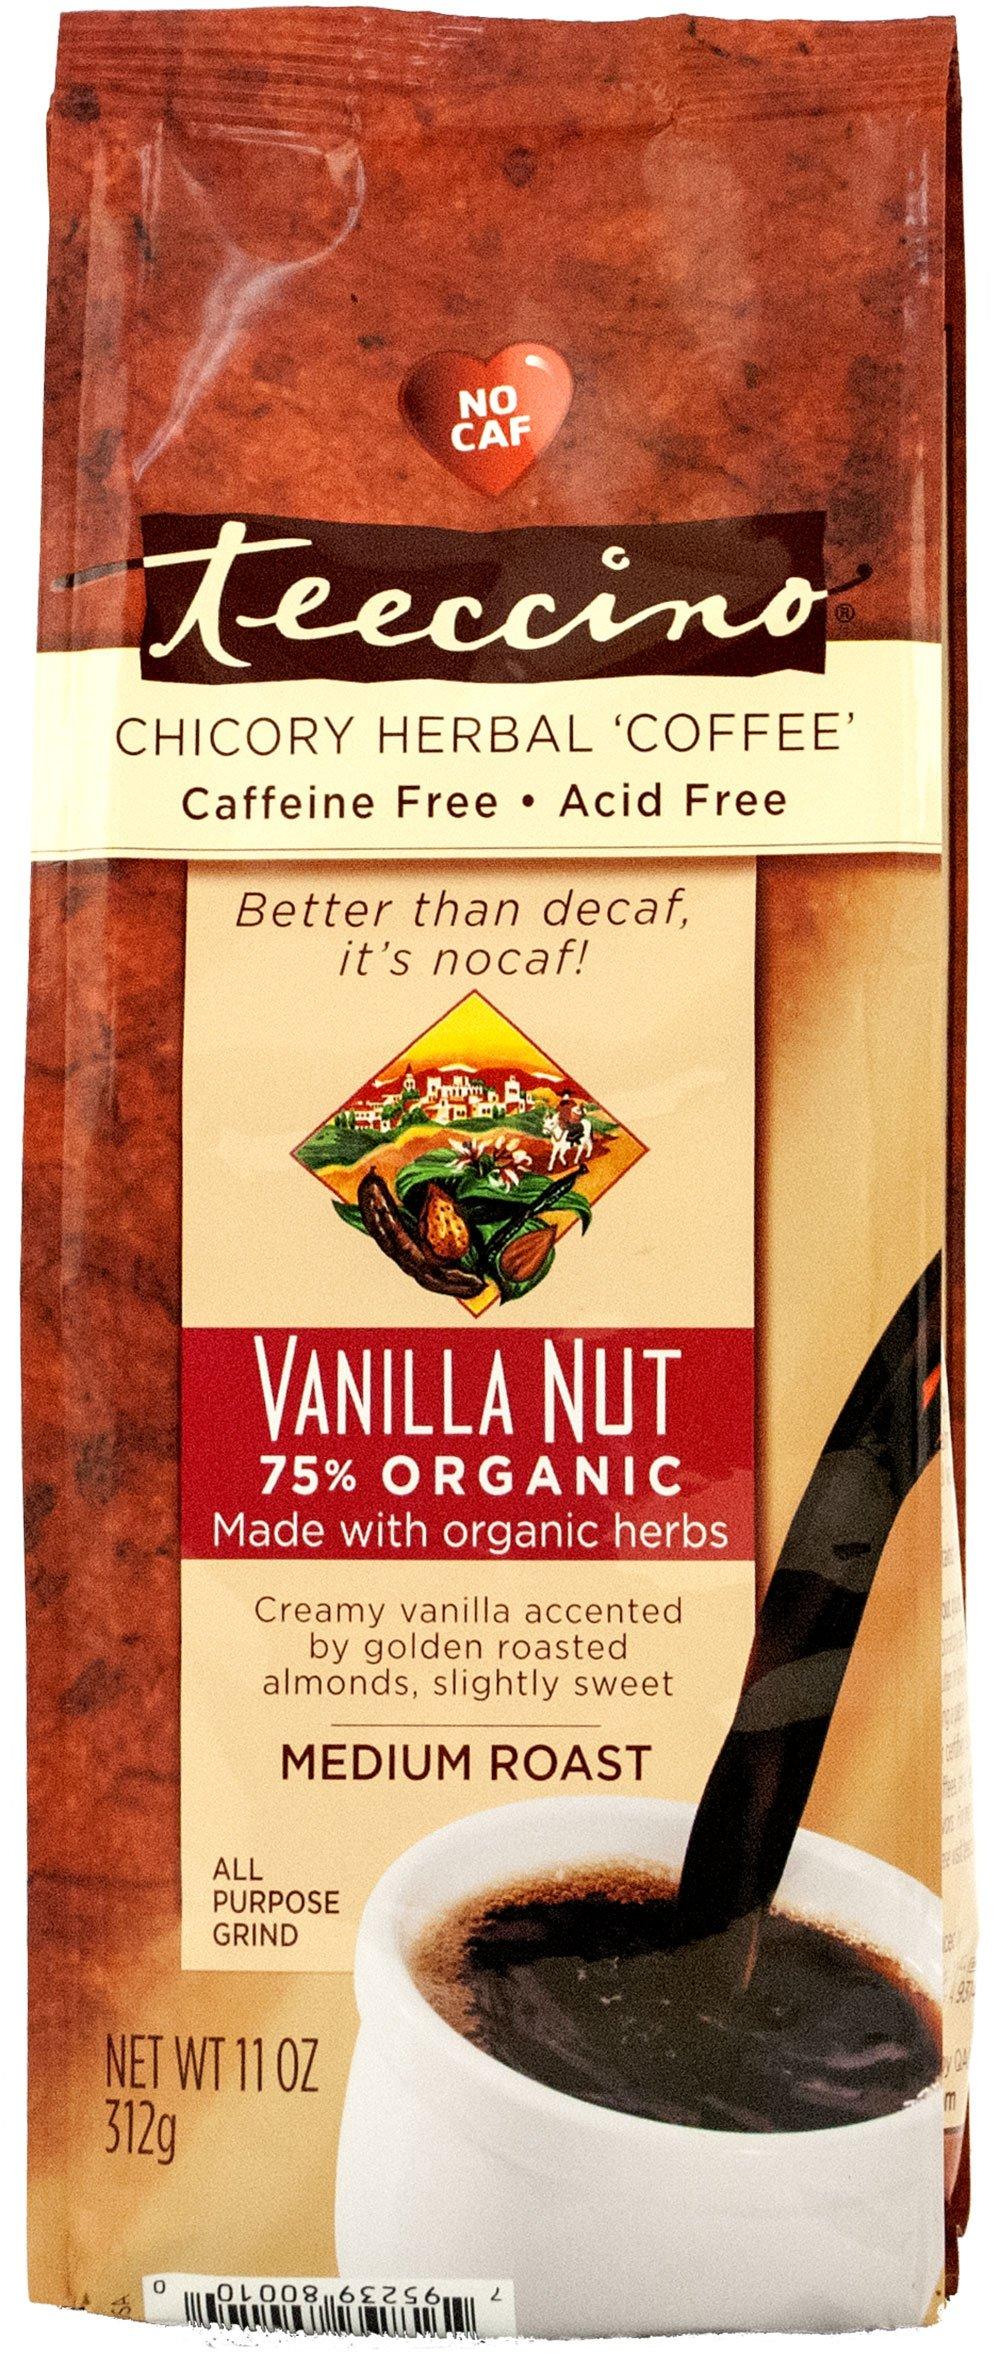 Teeccino Vanilla Nut Chicory Herbal Coffee Alternative, Caffeine Free, Acid Free, 11 Ounce